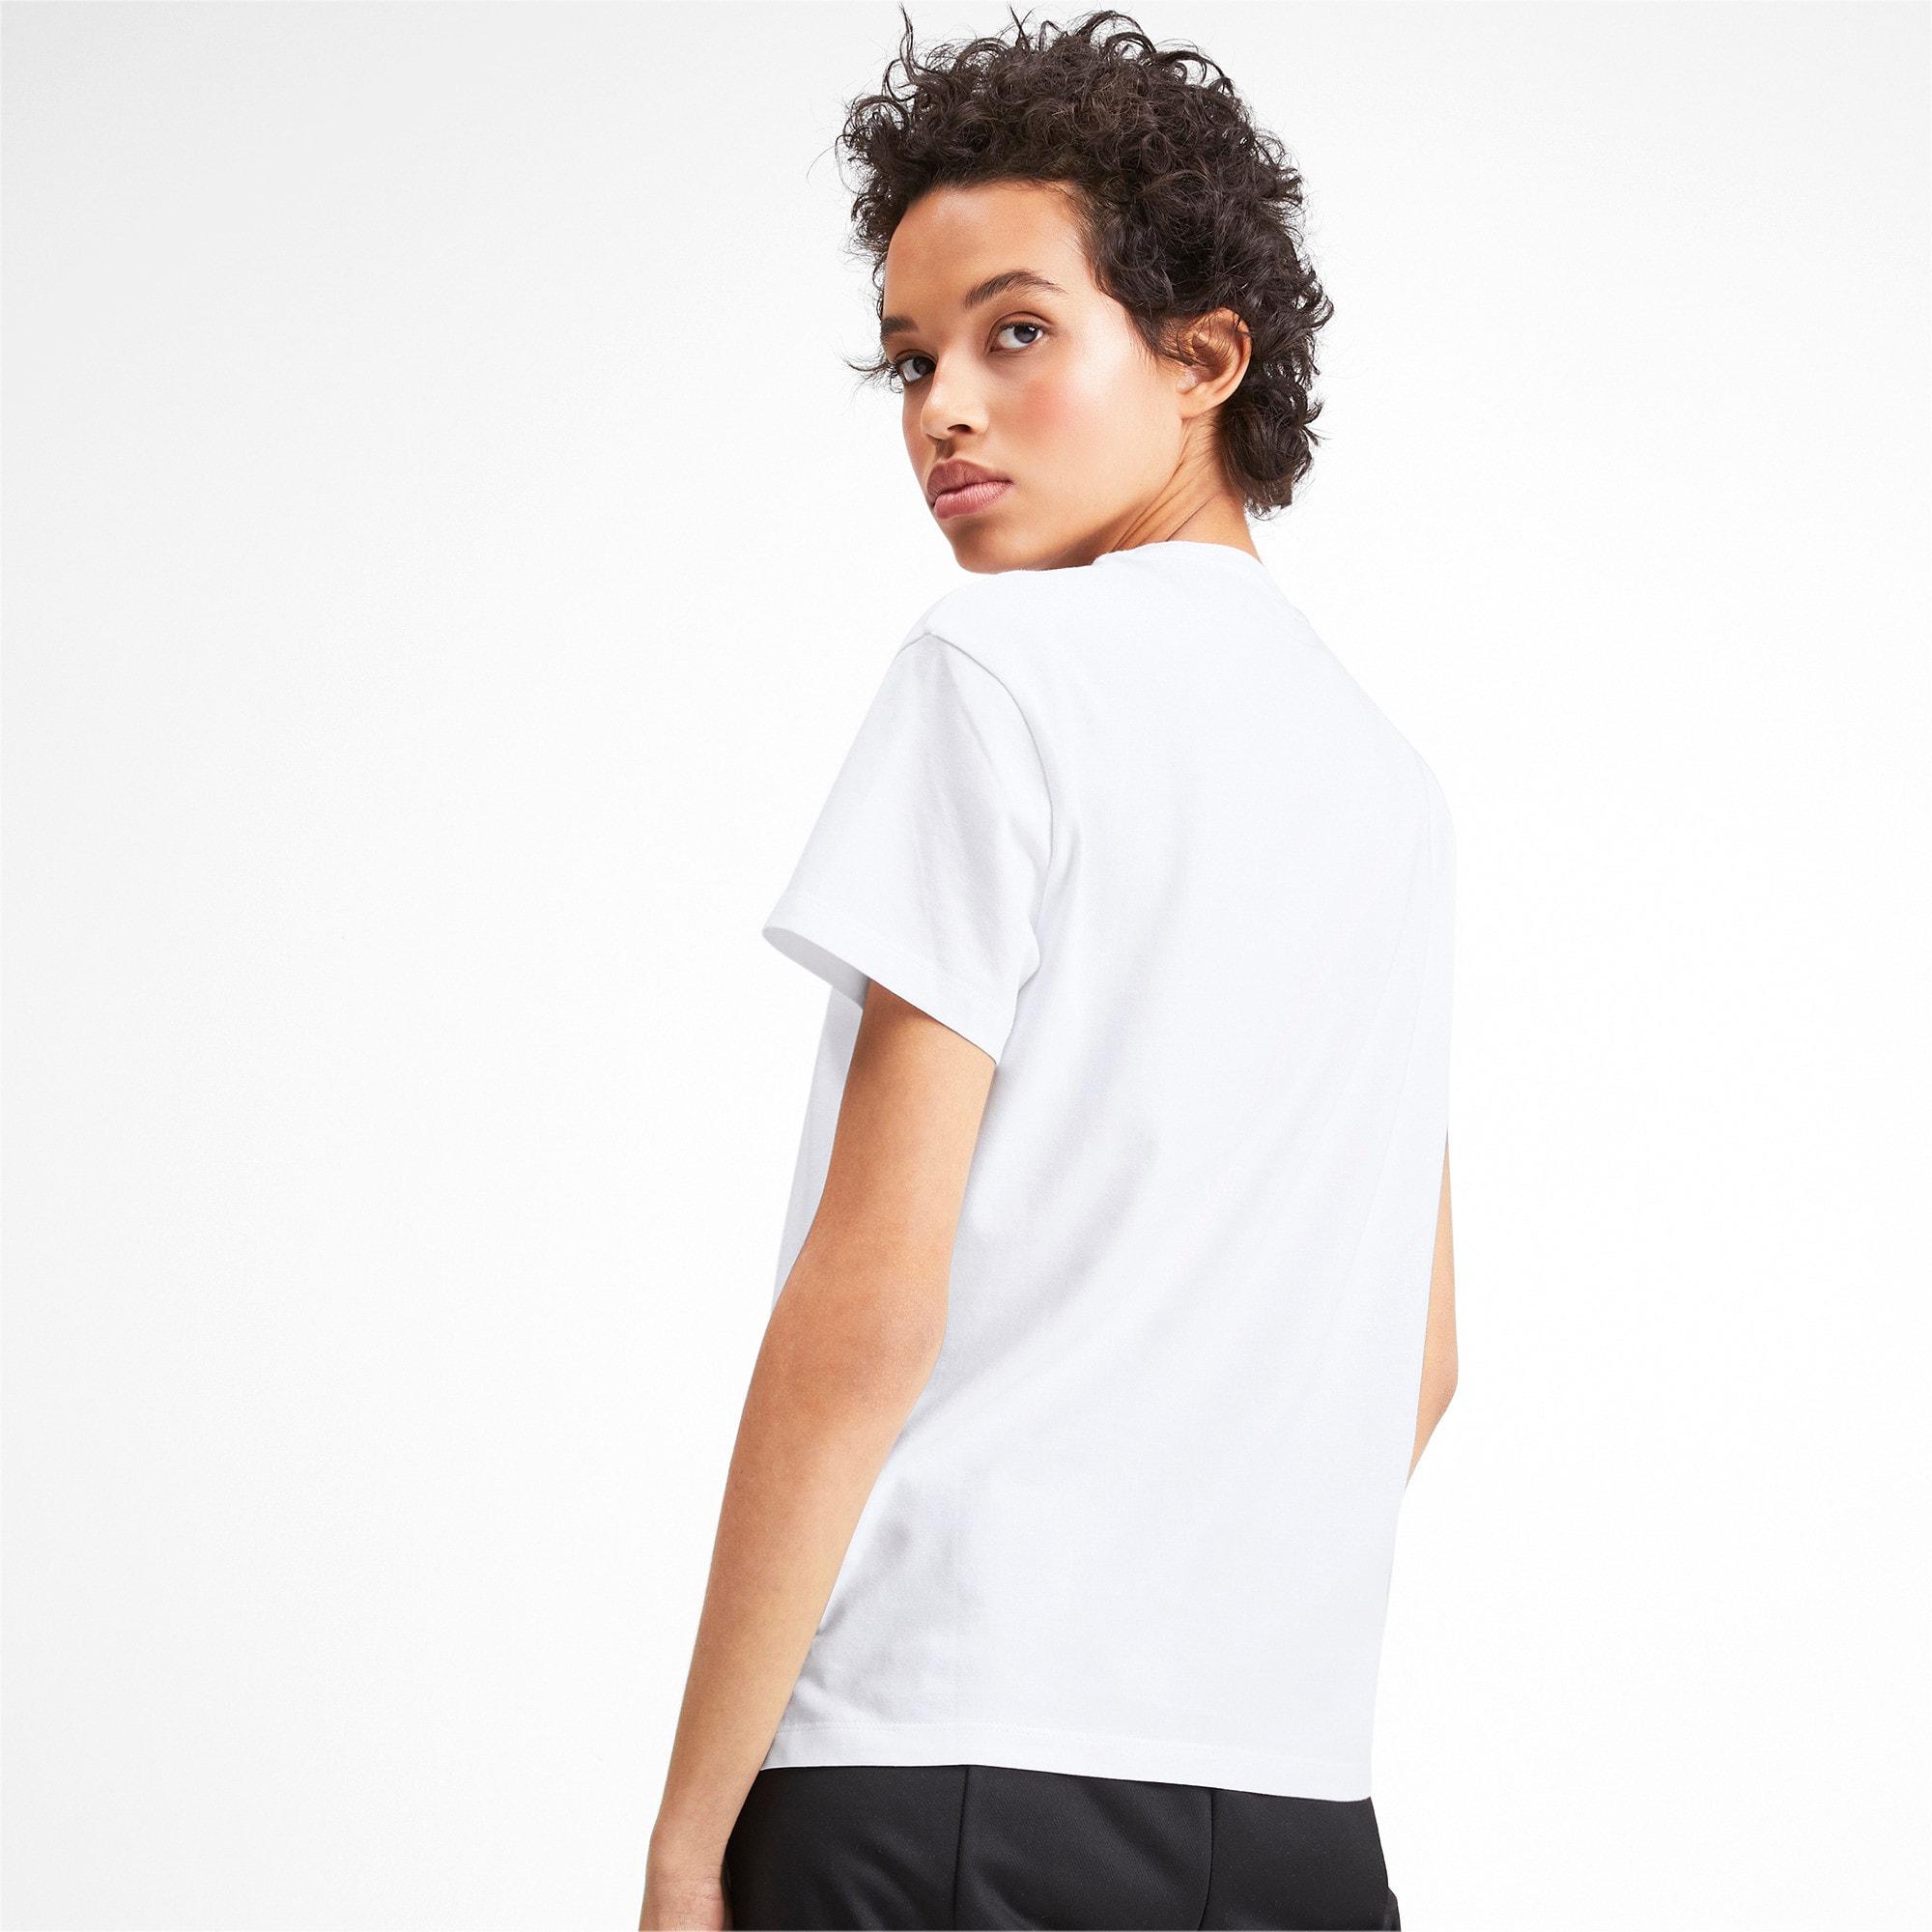 Thumbnail 3 of CLASSICS ロゴ ウィメンズ SS Tシャツ, Puma White, medium-JPN